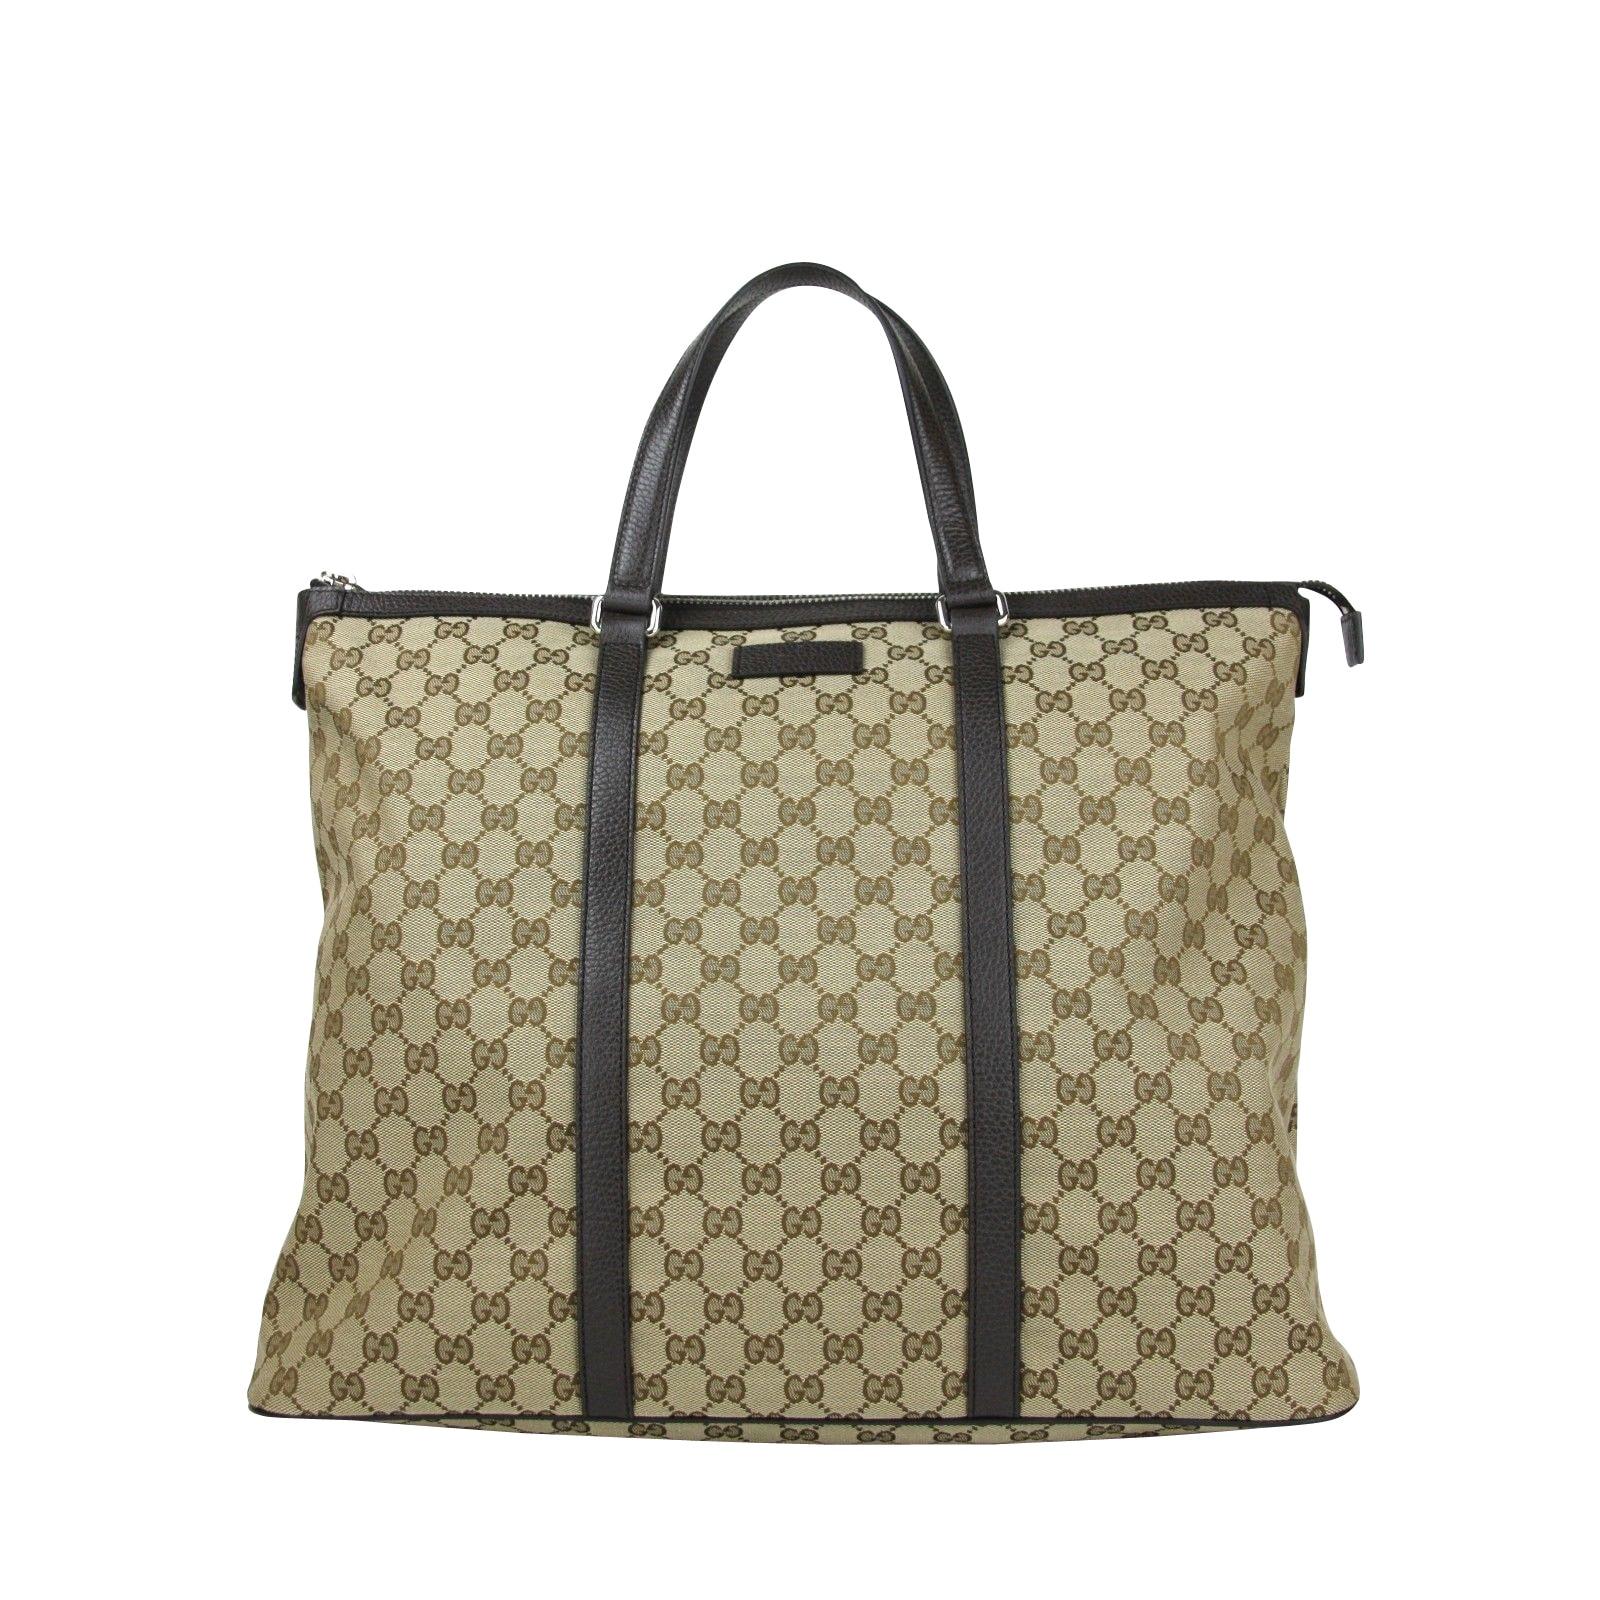 fd0efdc13fb205 Gucci Original GG Beige/Brown Canvas Leather Trim Zip Top Tote Bag 449170  9903 - One size